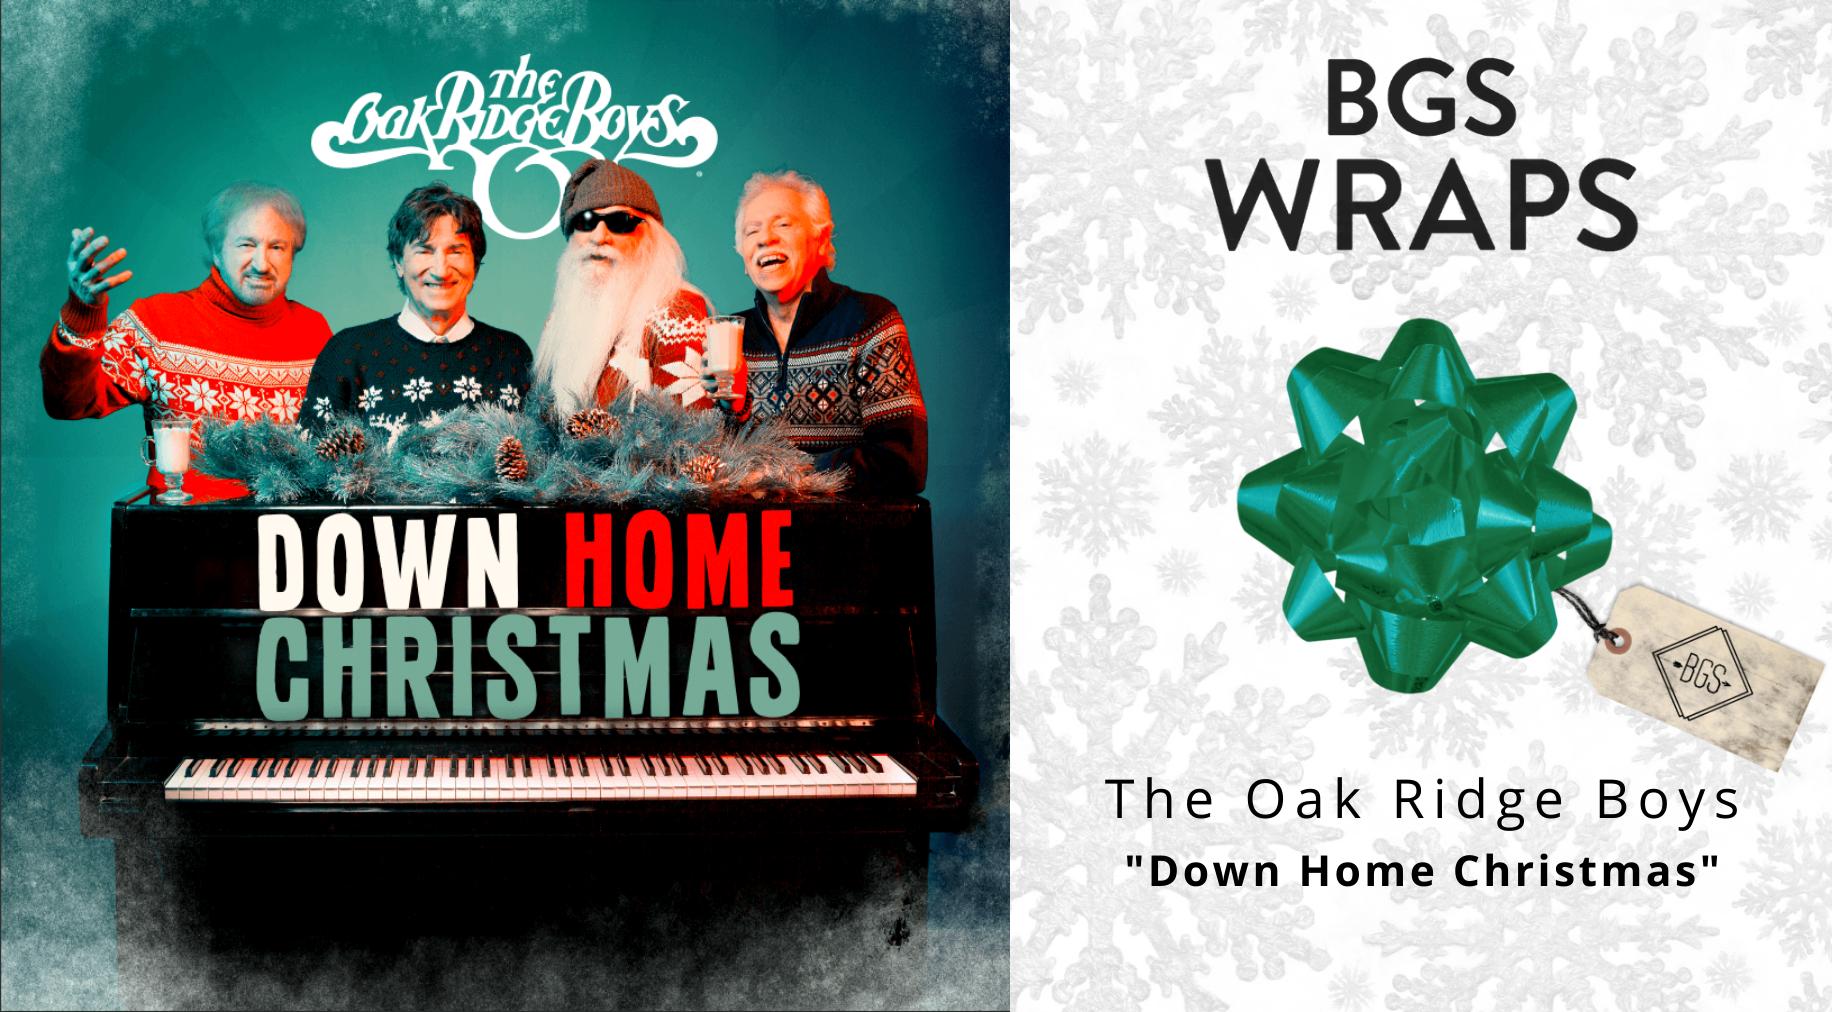 BGS WRAPS: The Oak Ridge Boys,